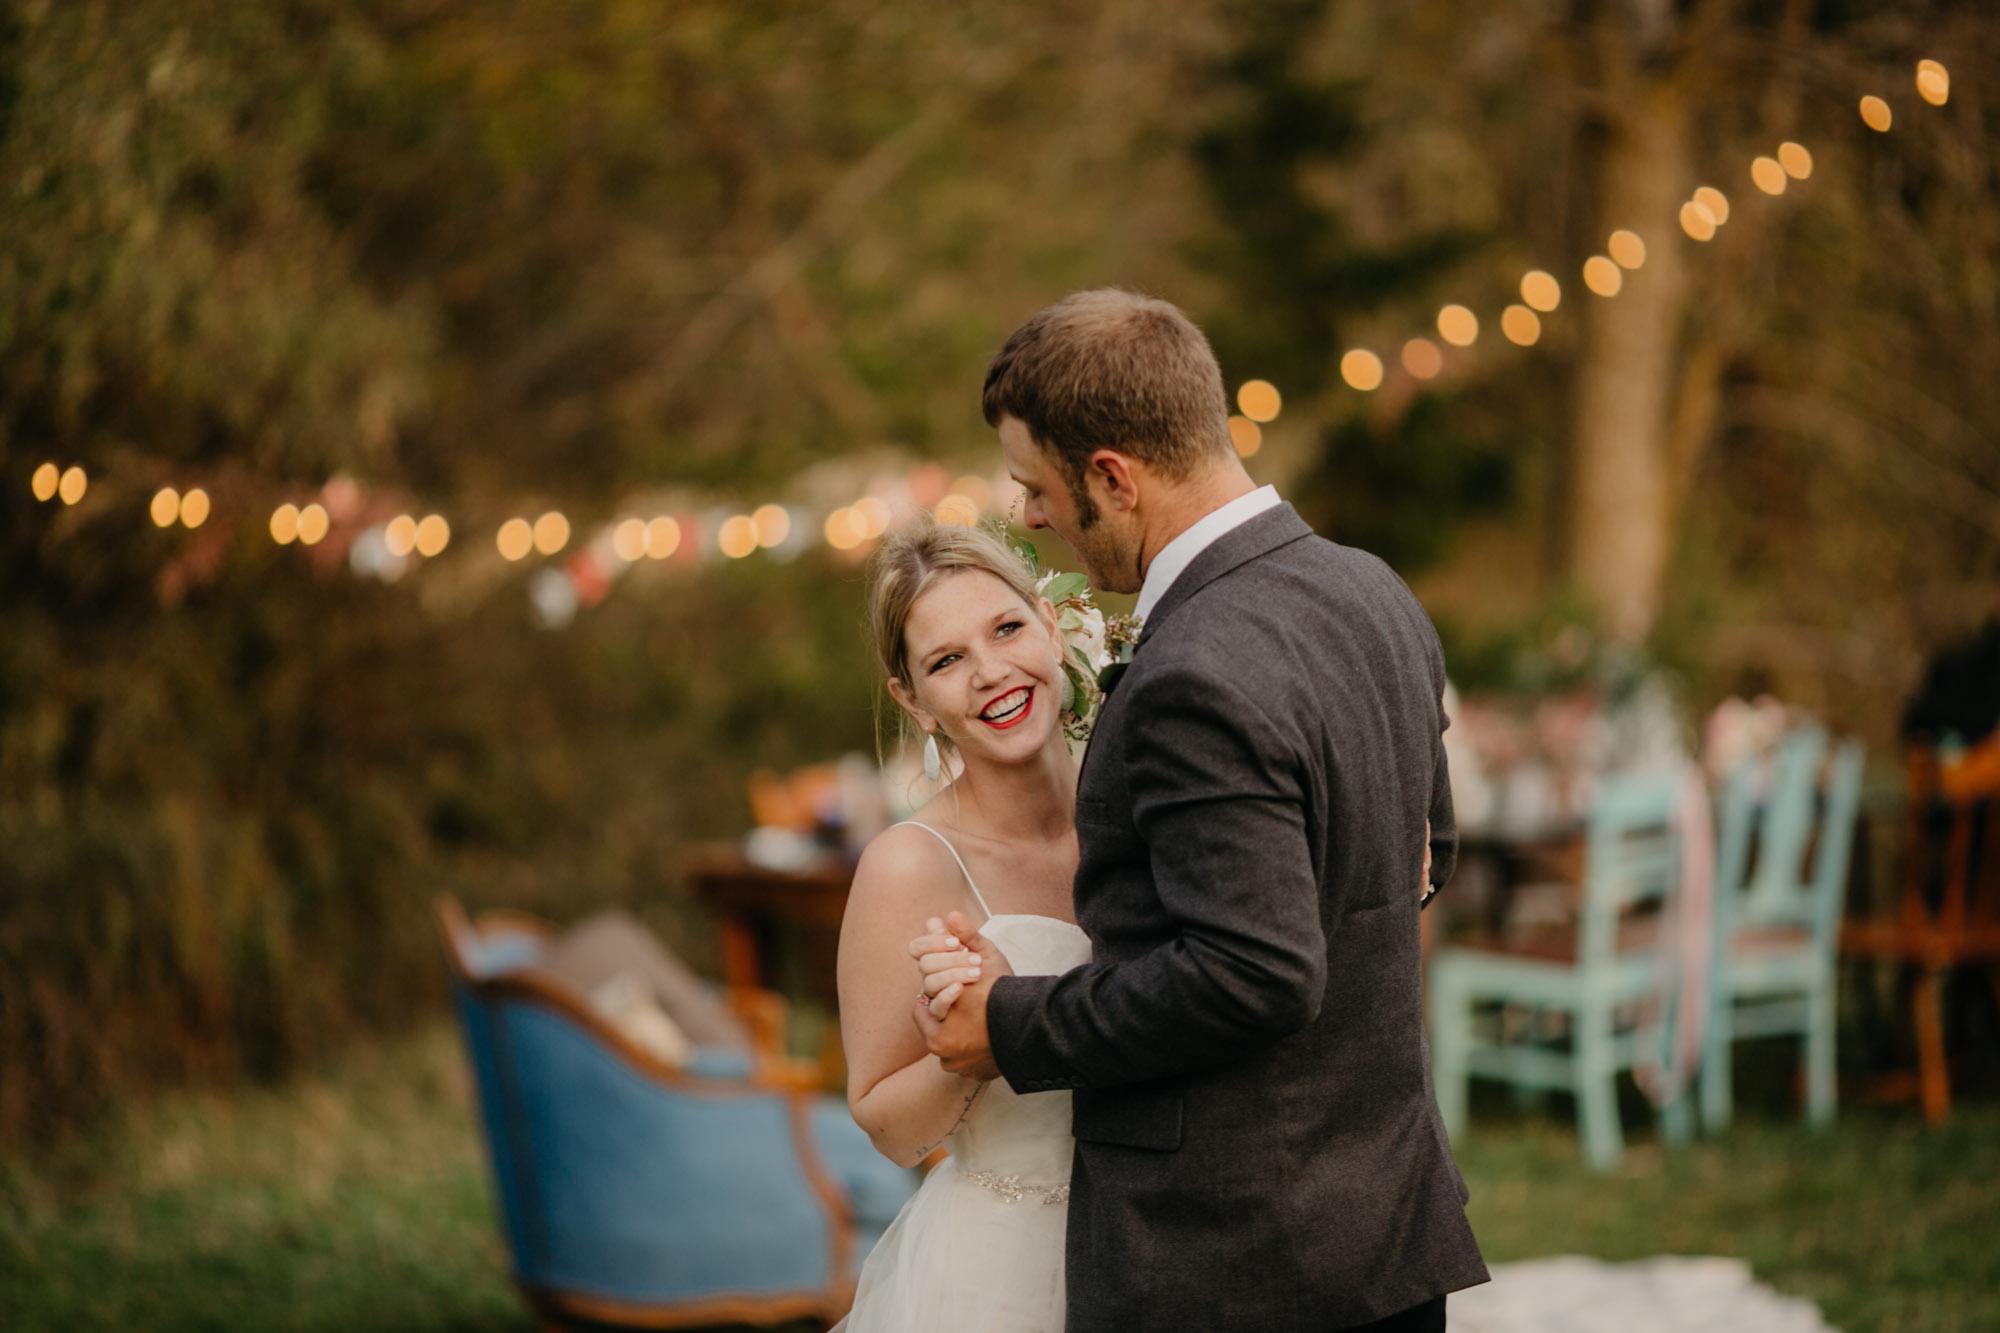 omaha-wedding-photographer-meghan-time-48.jpg